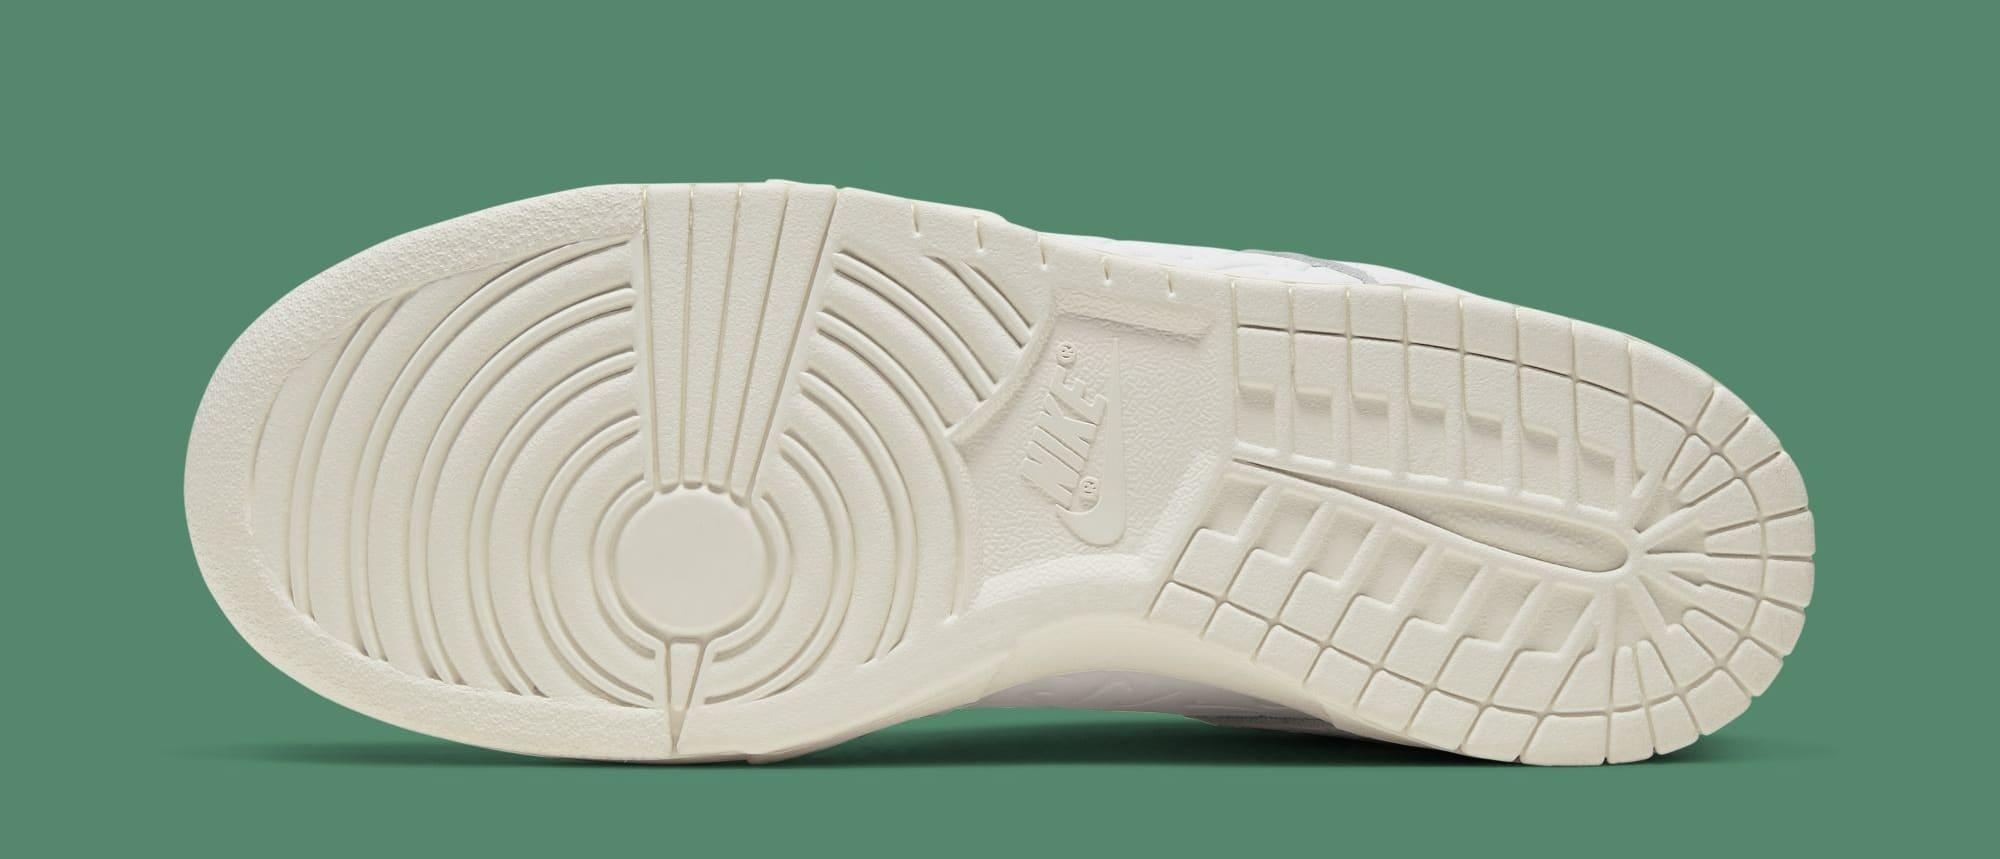 Ben-G x Nike SB Dunk Low CU3846-100 (Sole)